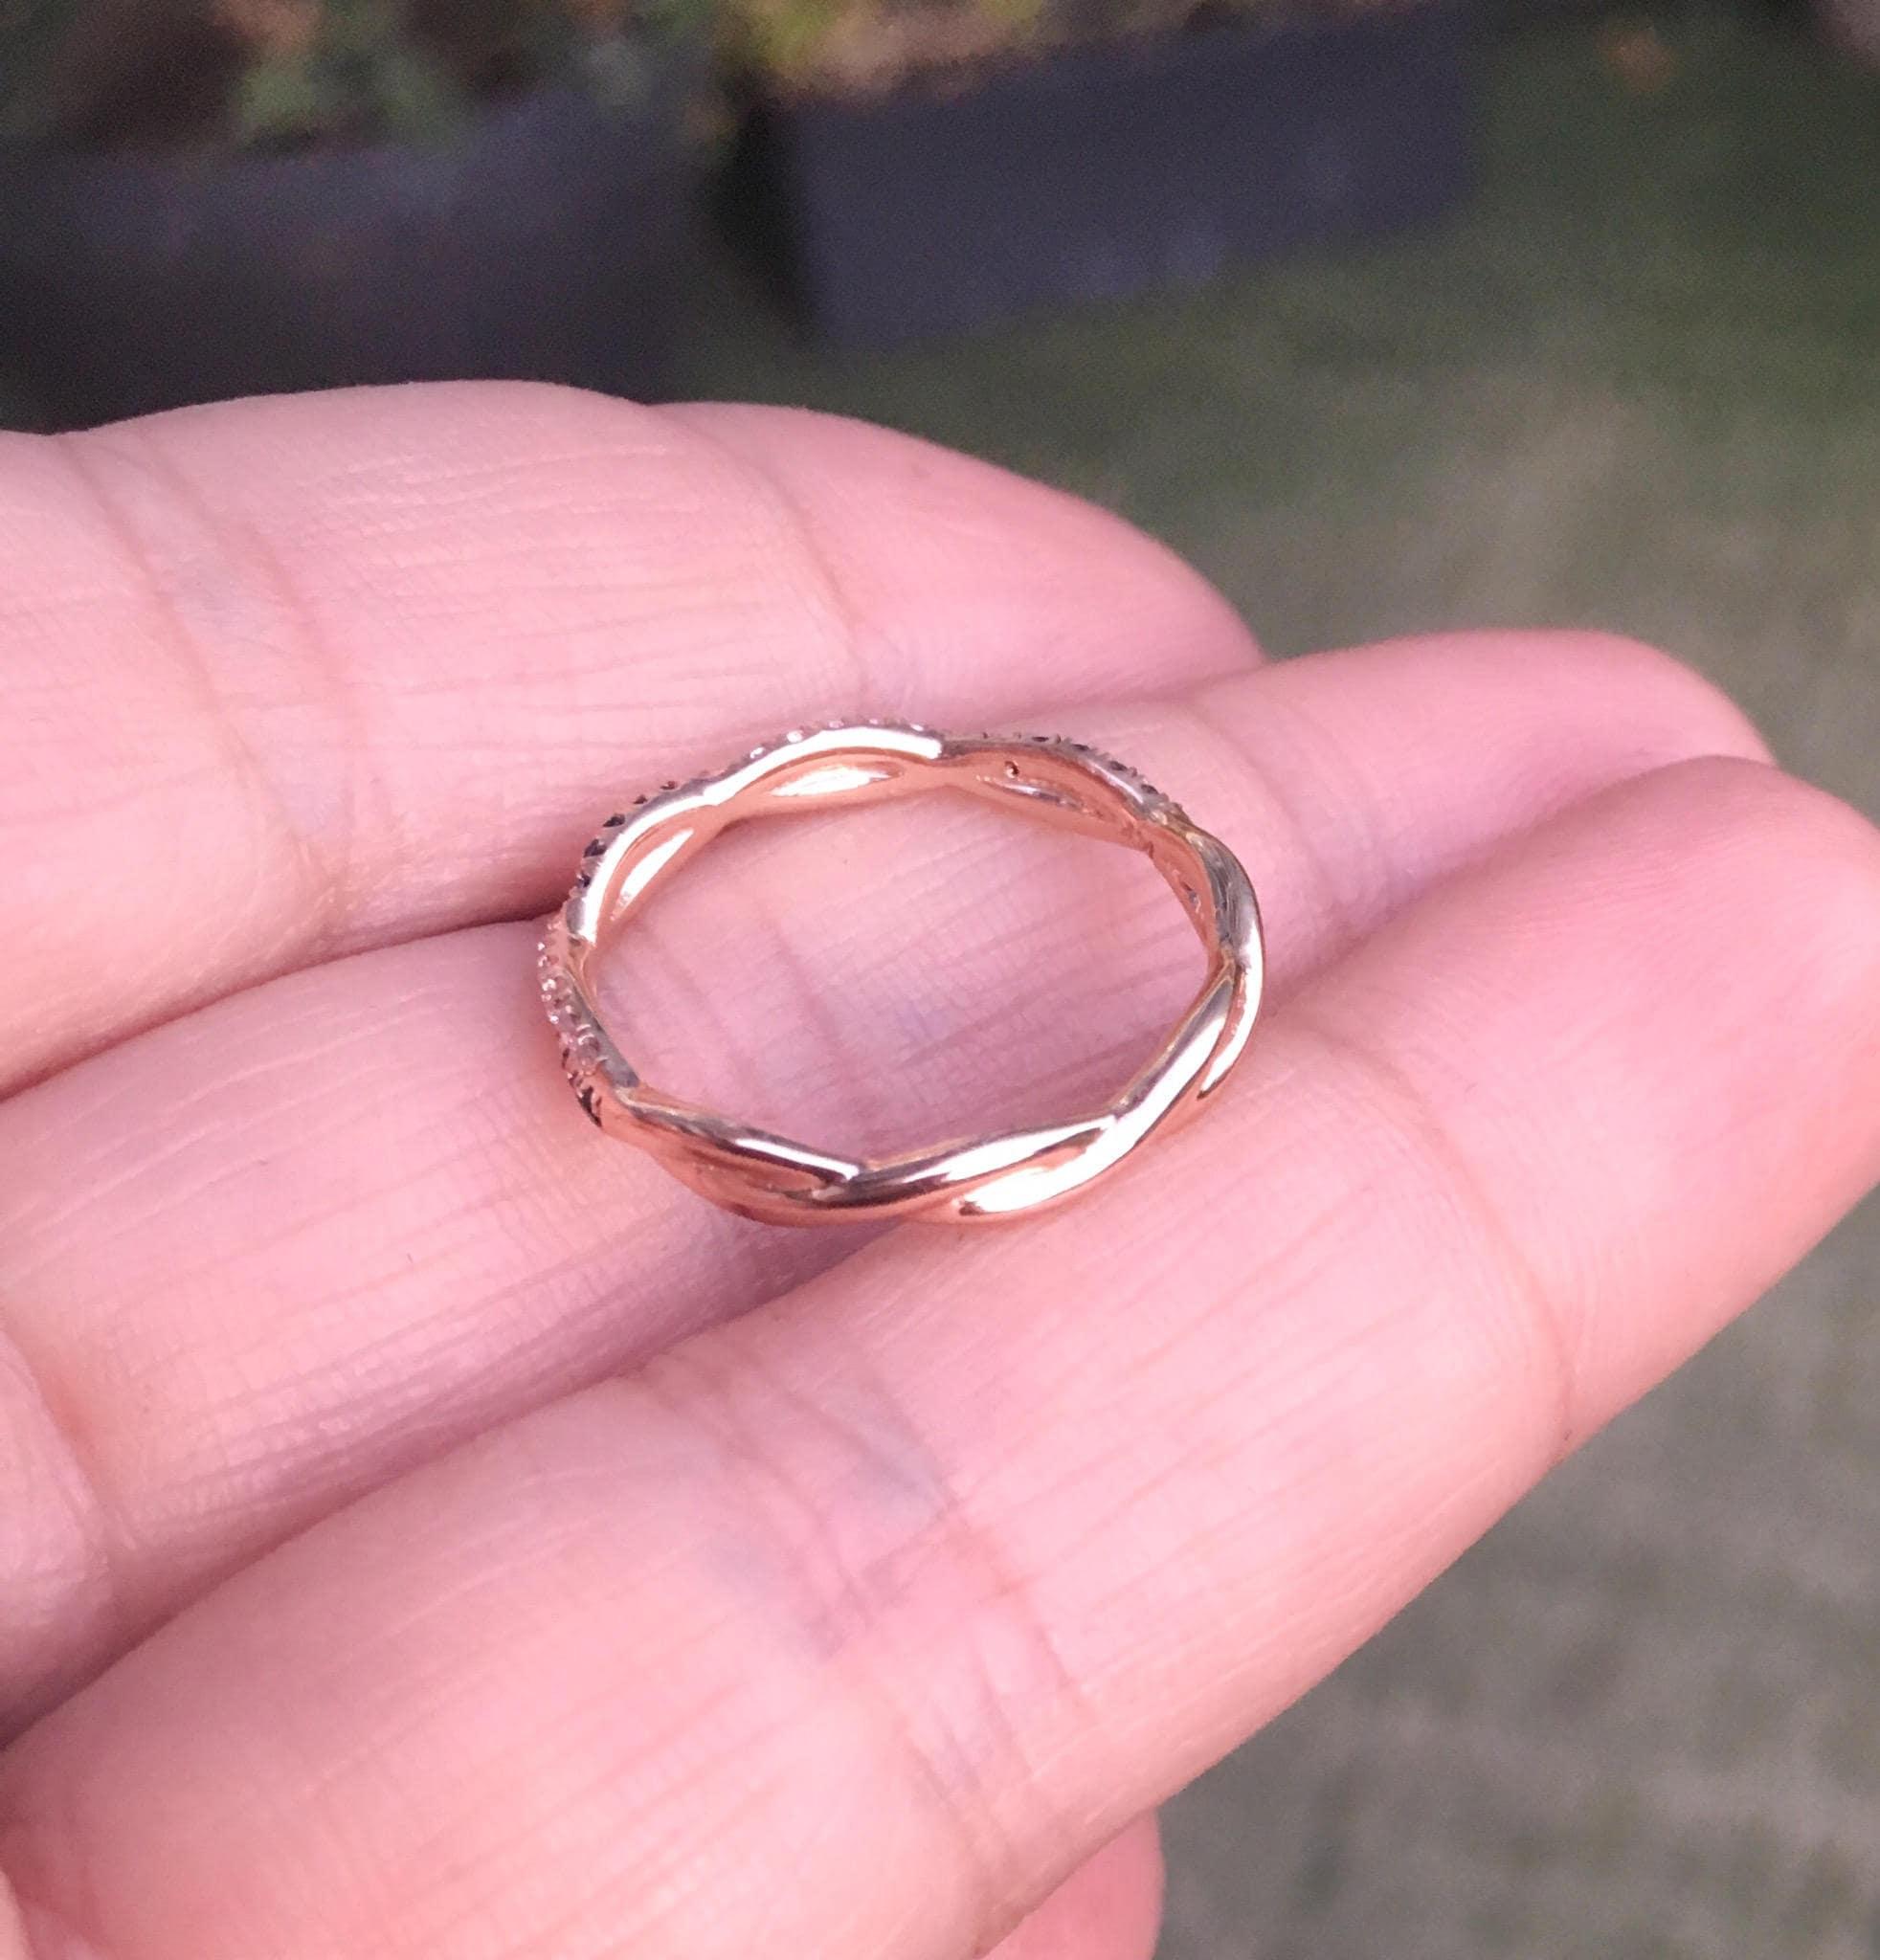 Diamond Twist Ring Black & White Diamond Twistband Delicate ...